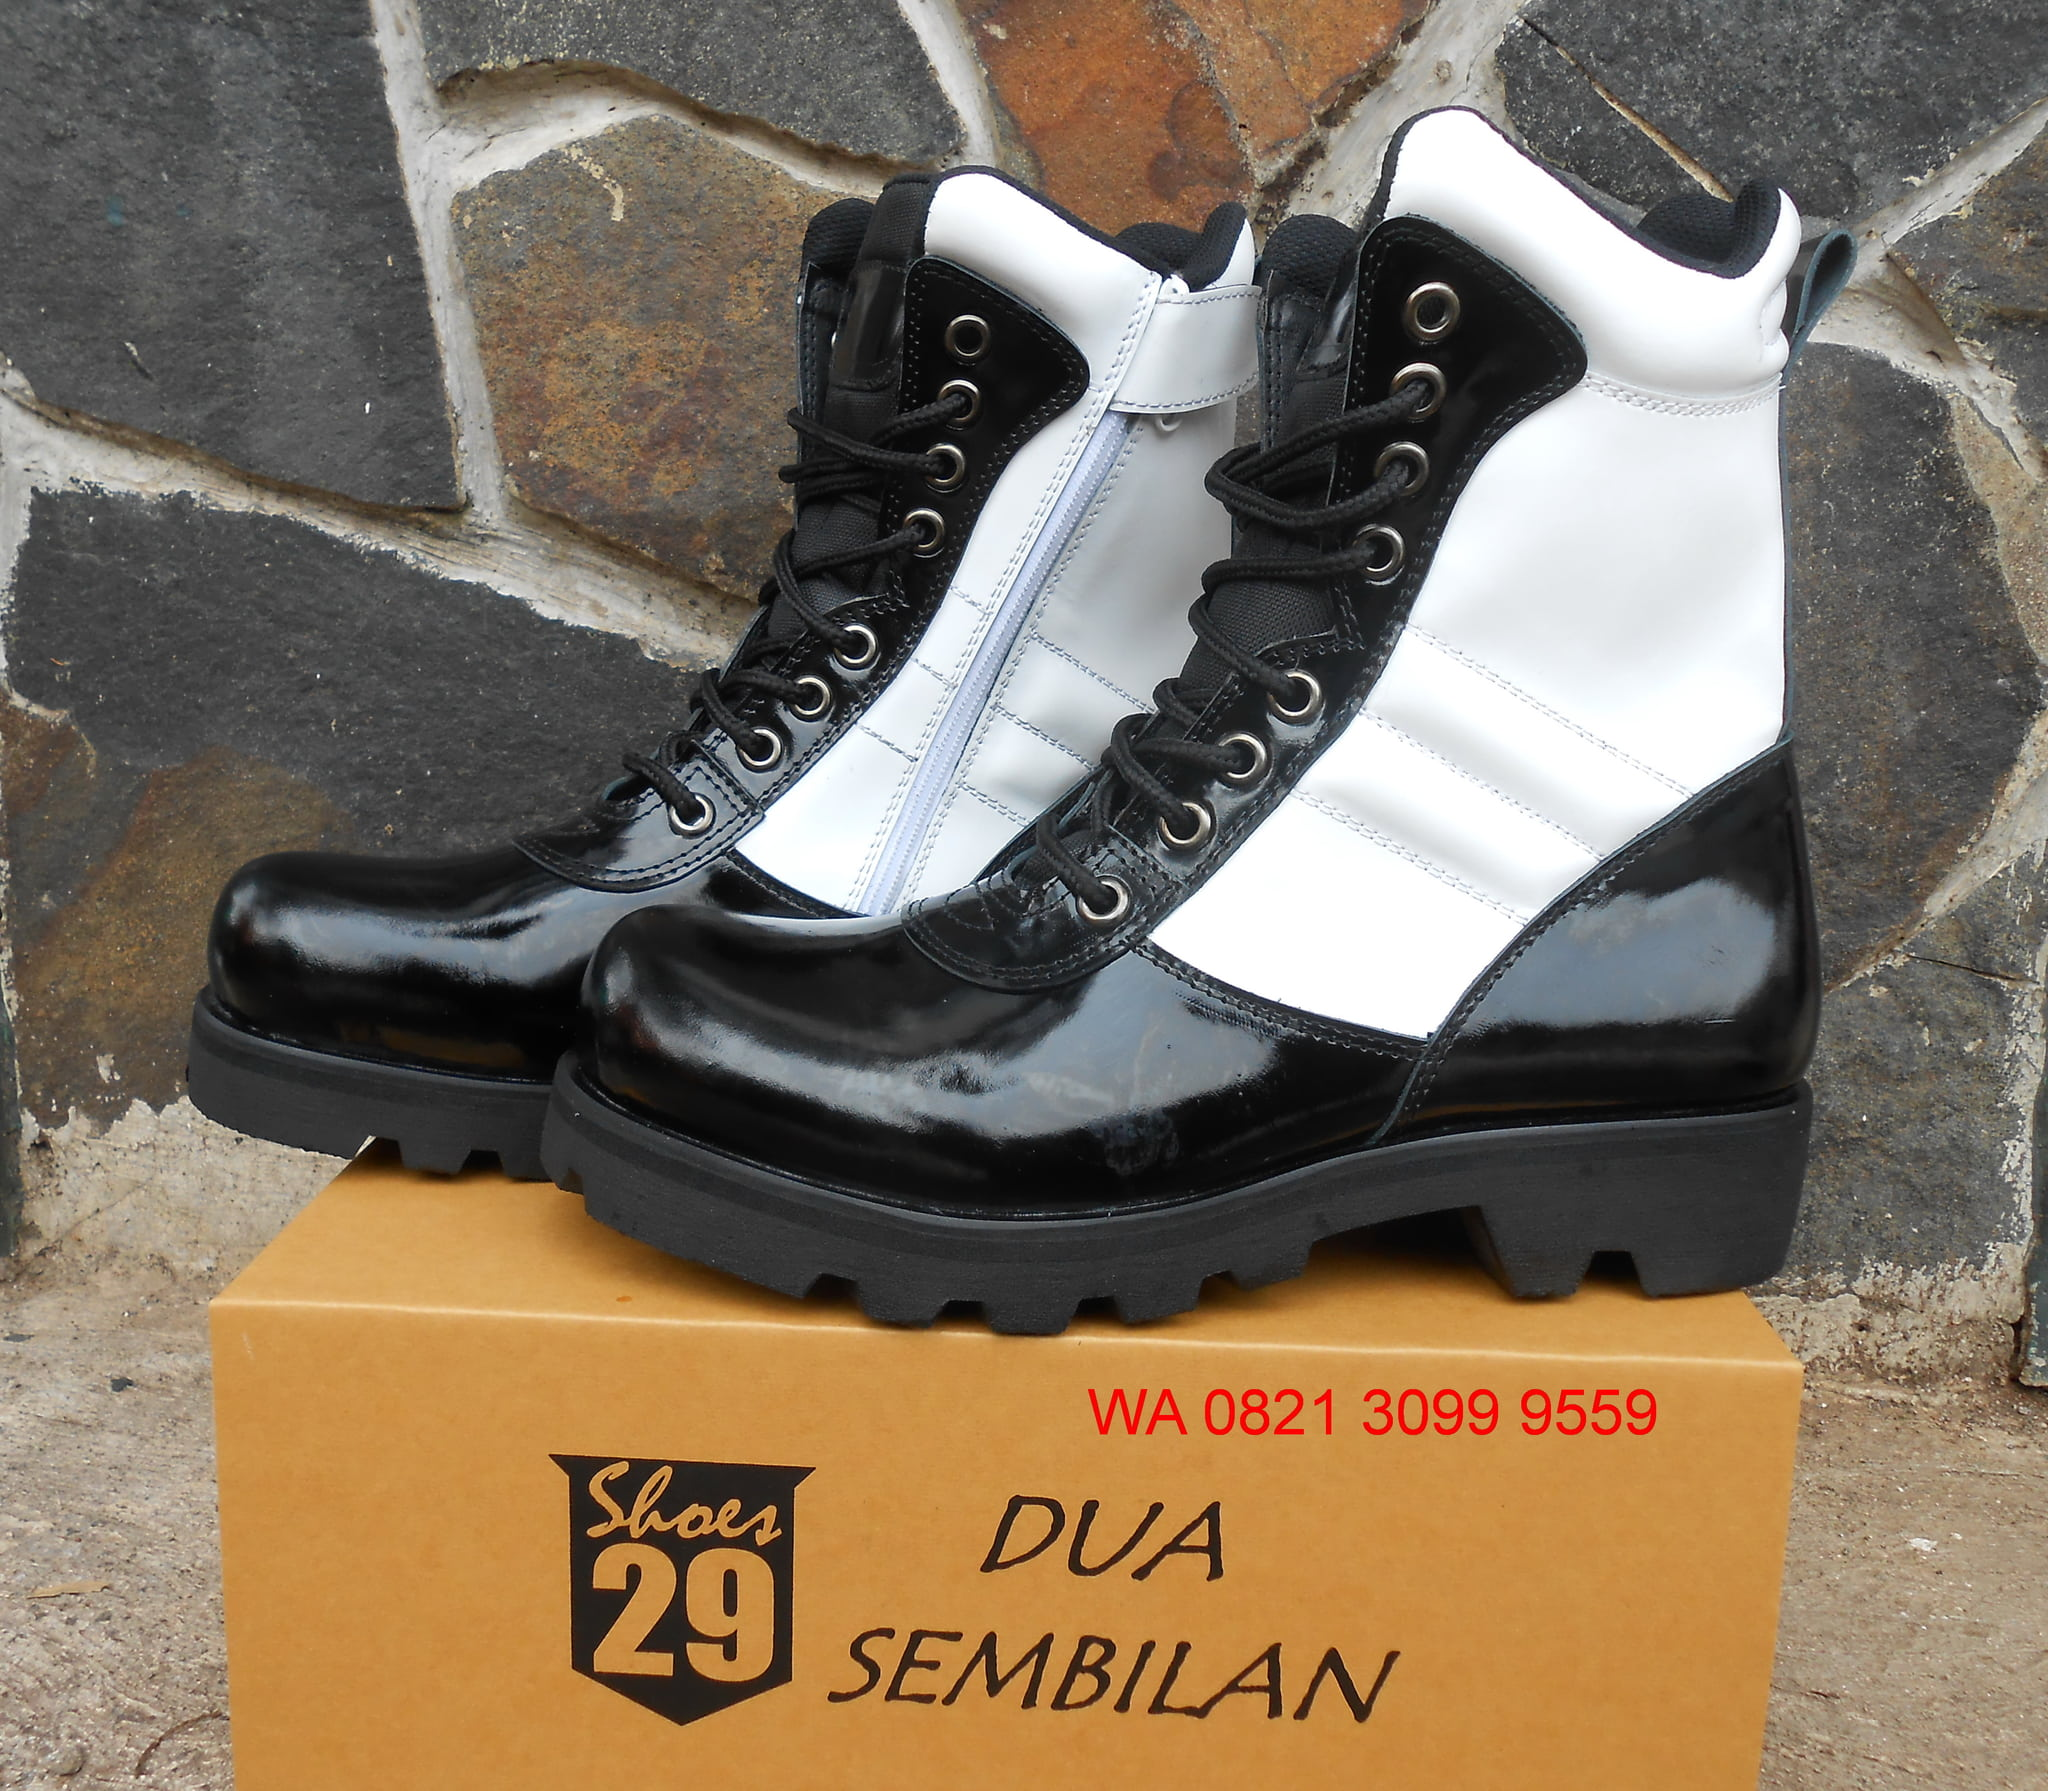 Sepatu Pdl Provos Tni - Sepatu Boot Provos Tni 0cbc04b272